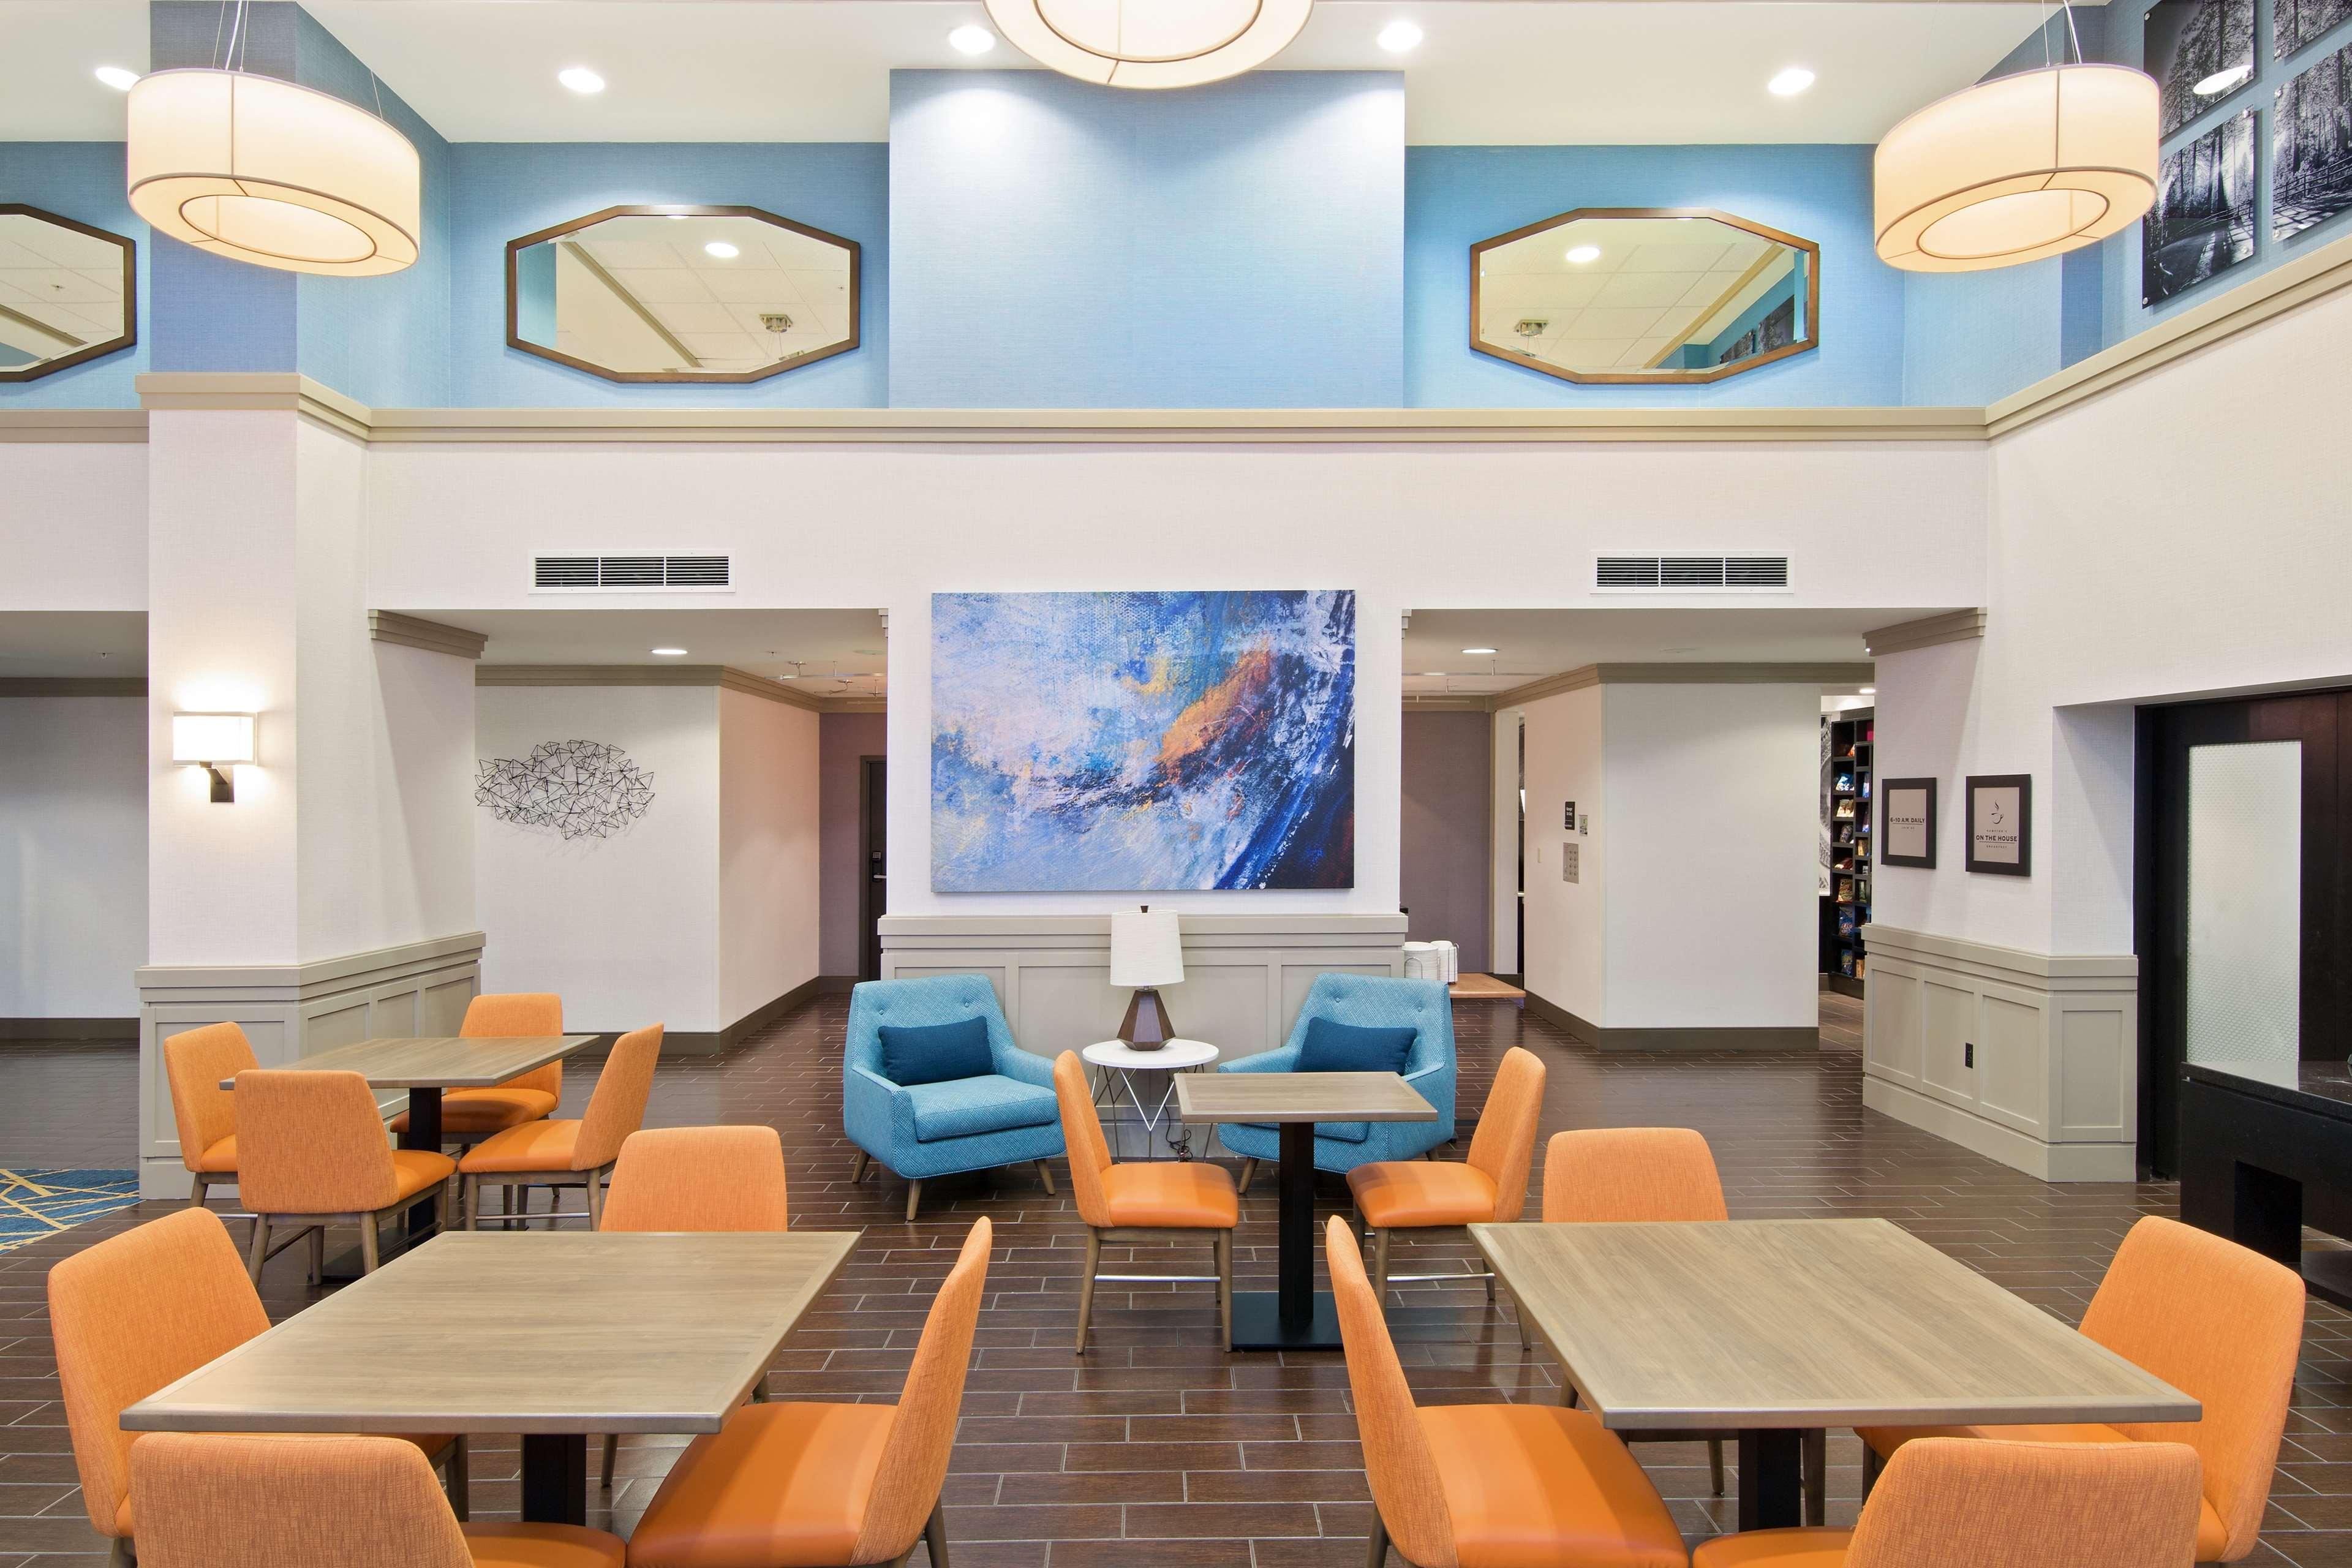 Hampton Inn & Suites Spokane Valley image 5